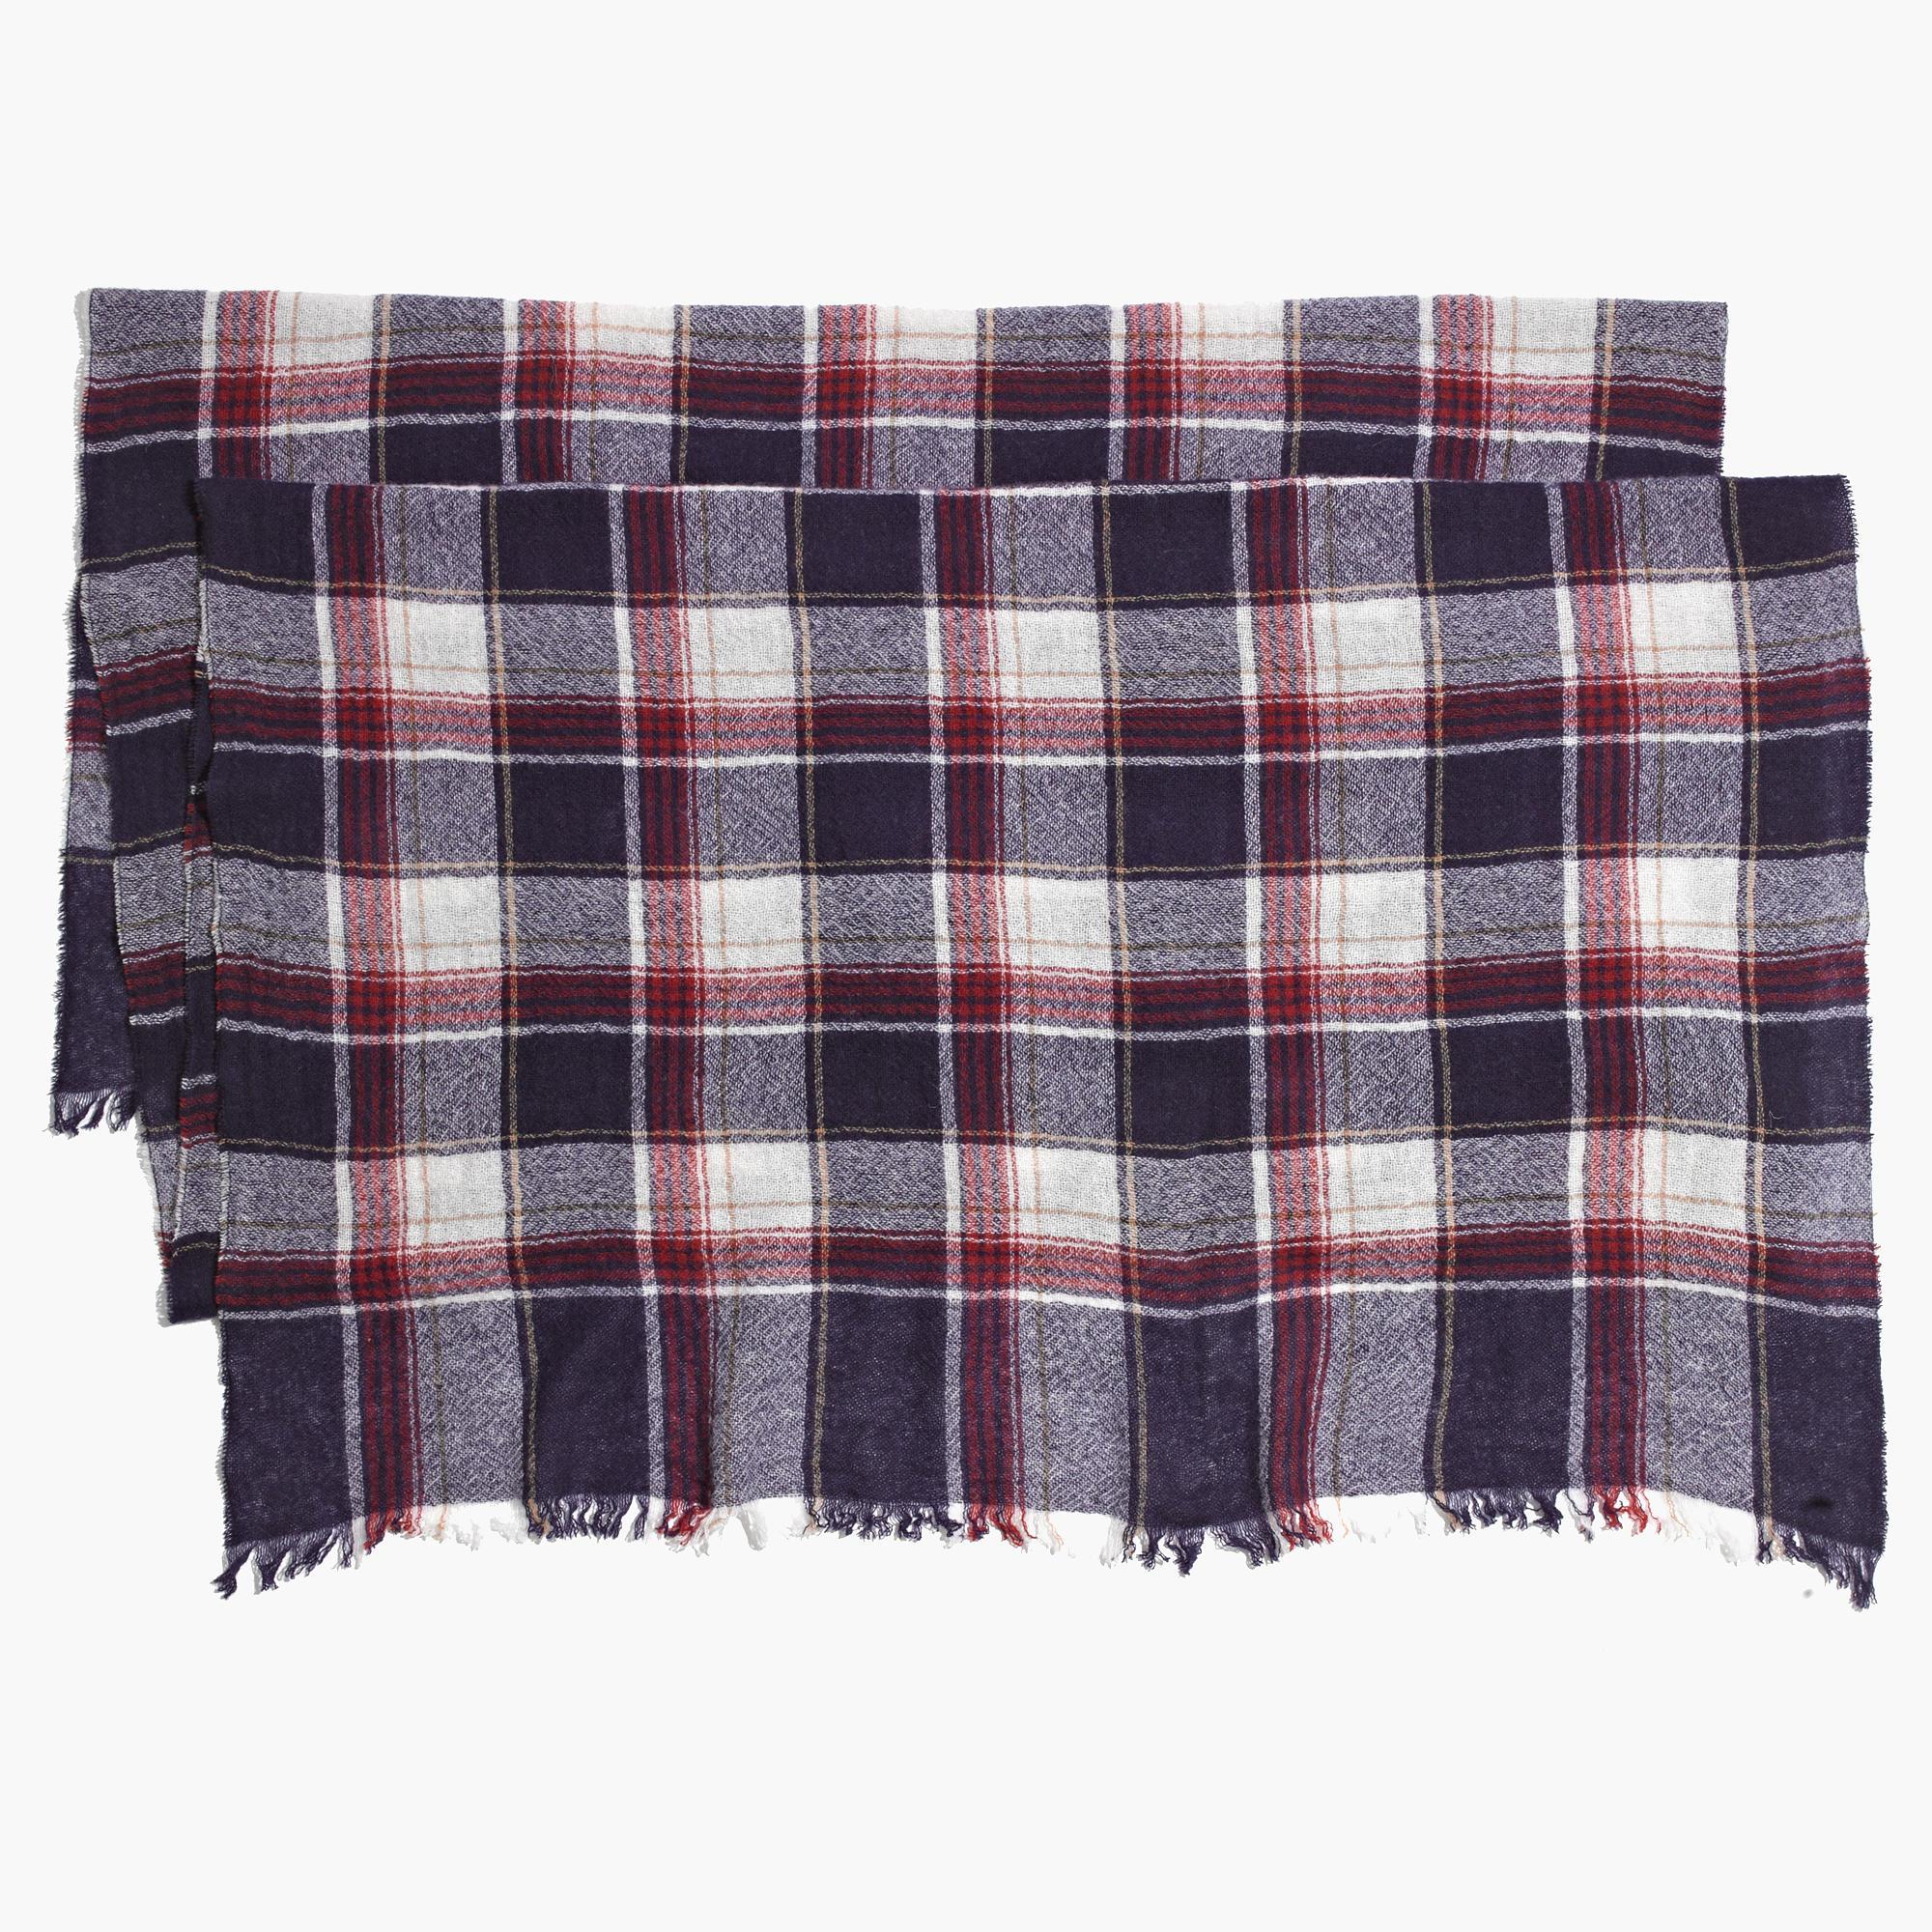 Rangeplaid scarf